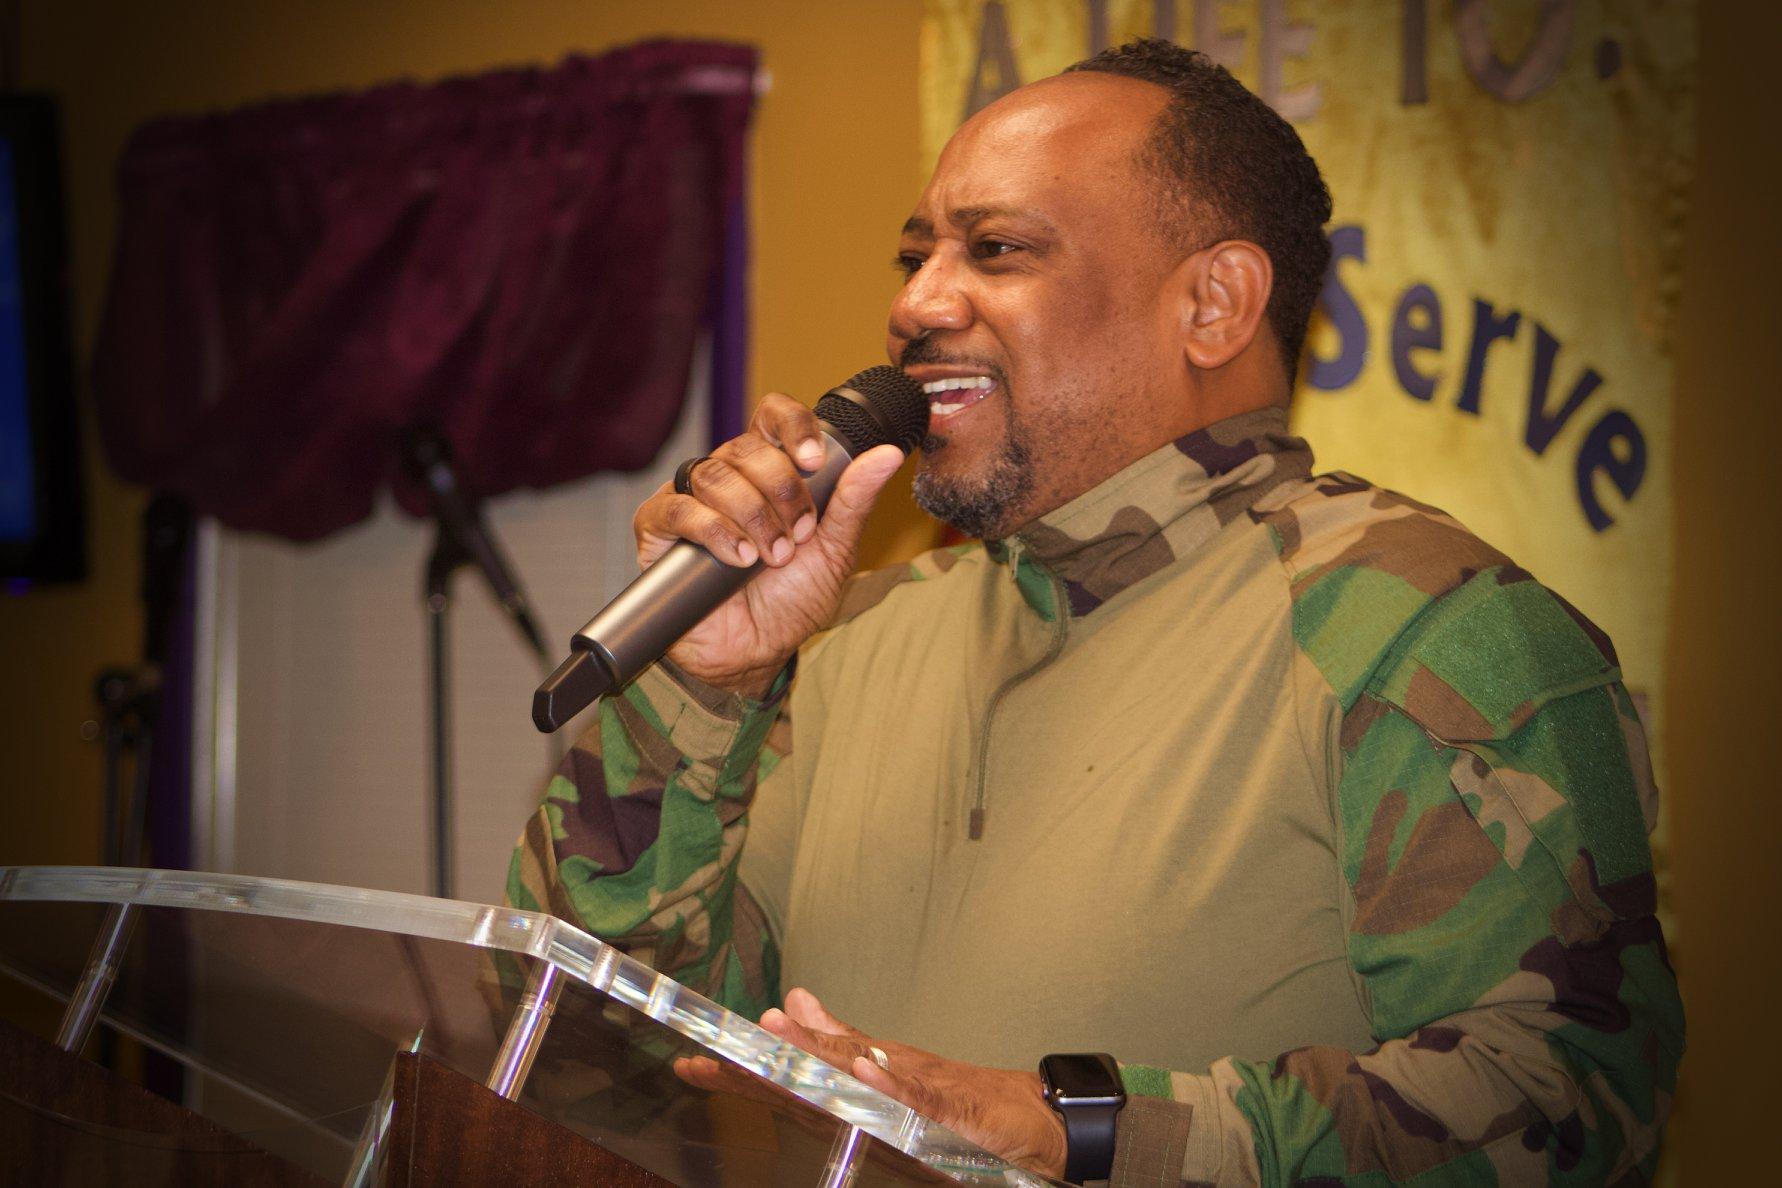 pastor_preaching2